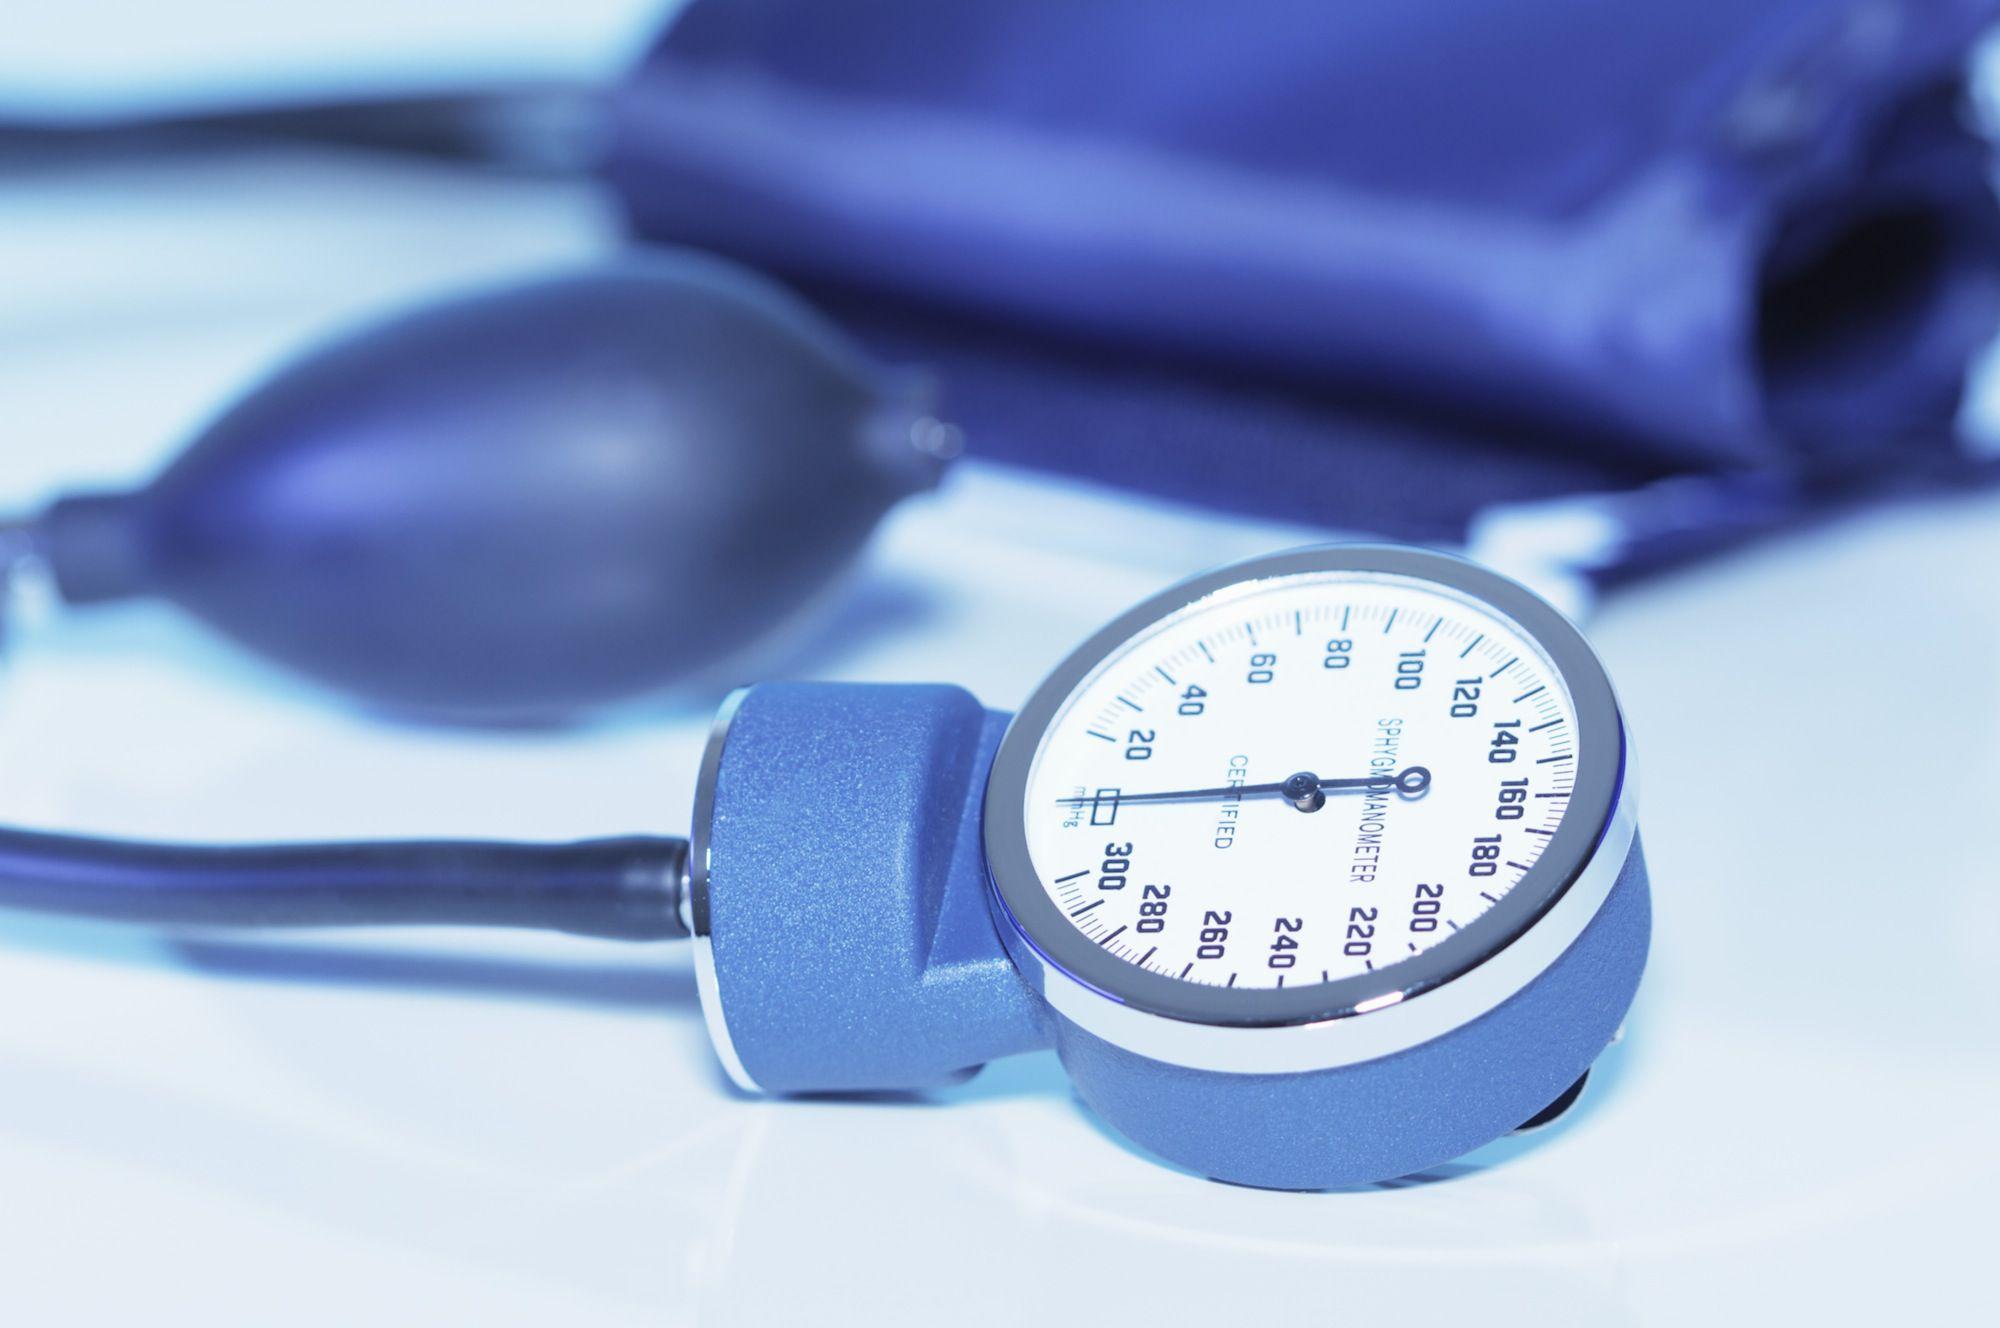 Aneroid sphygmomanometer - Mechanical blood pressure gauge